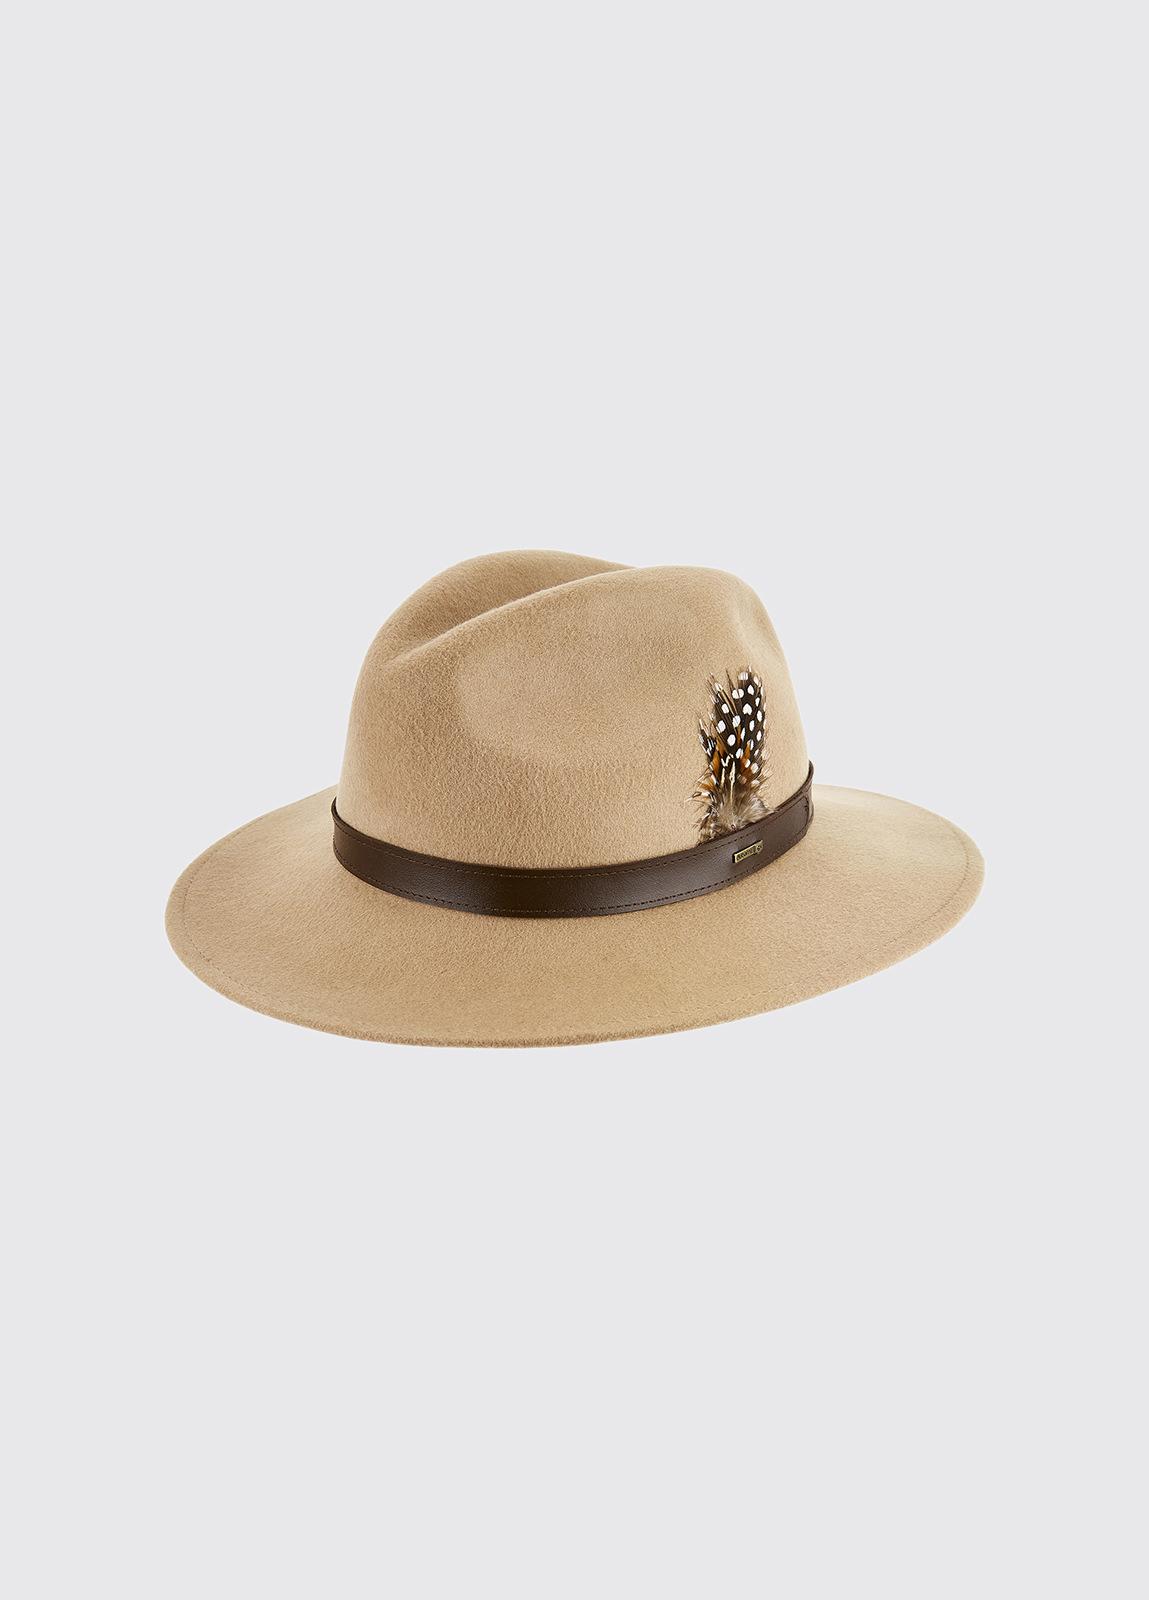 Gallagher Felt Hat - Sand